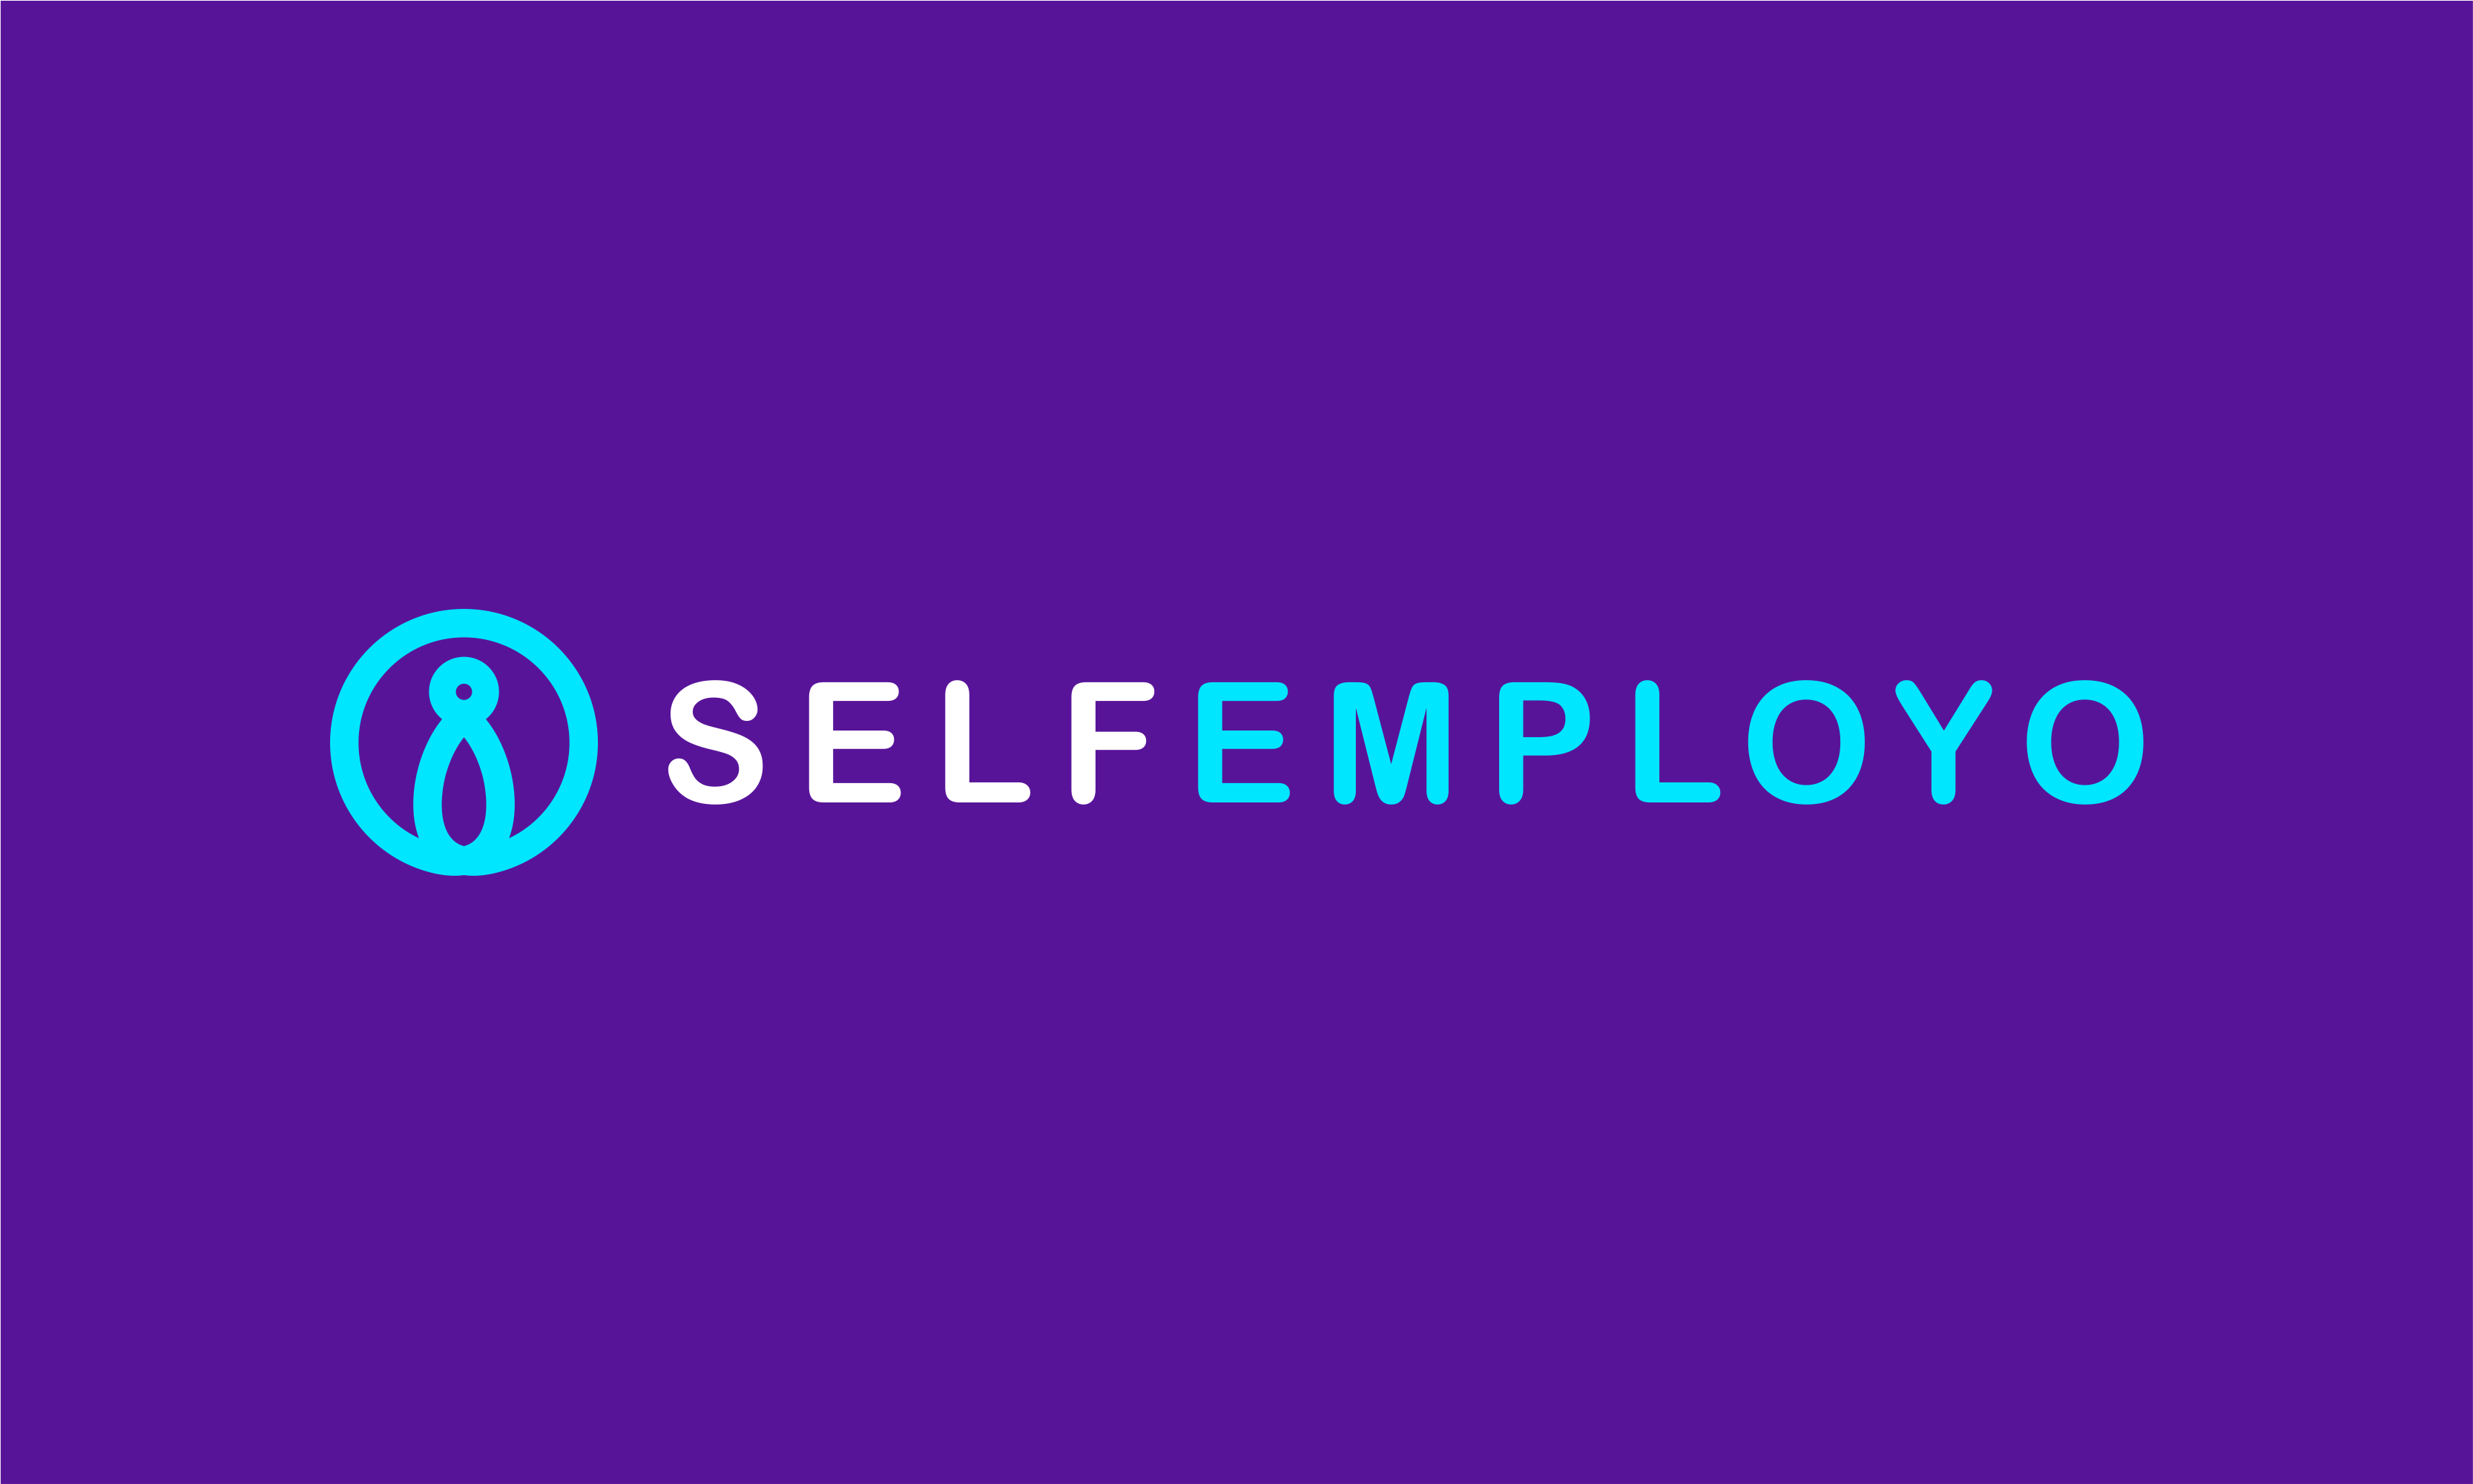 Selfemployo